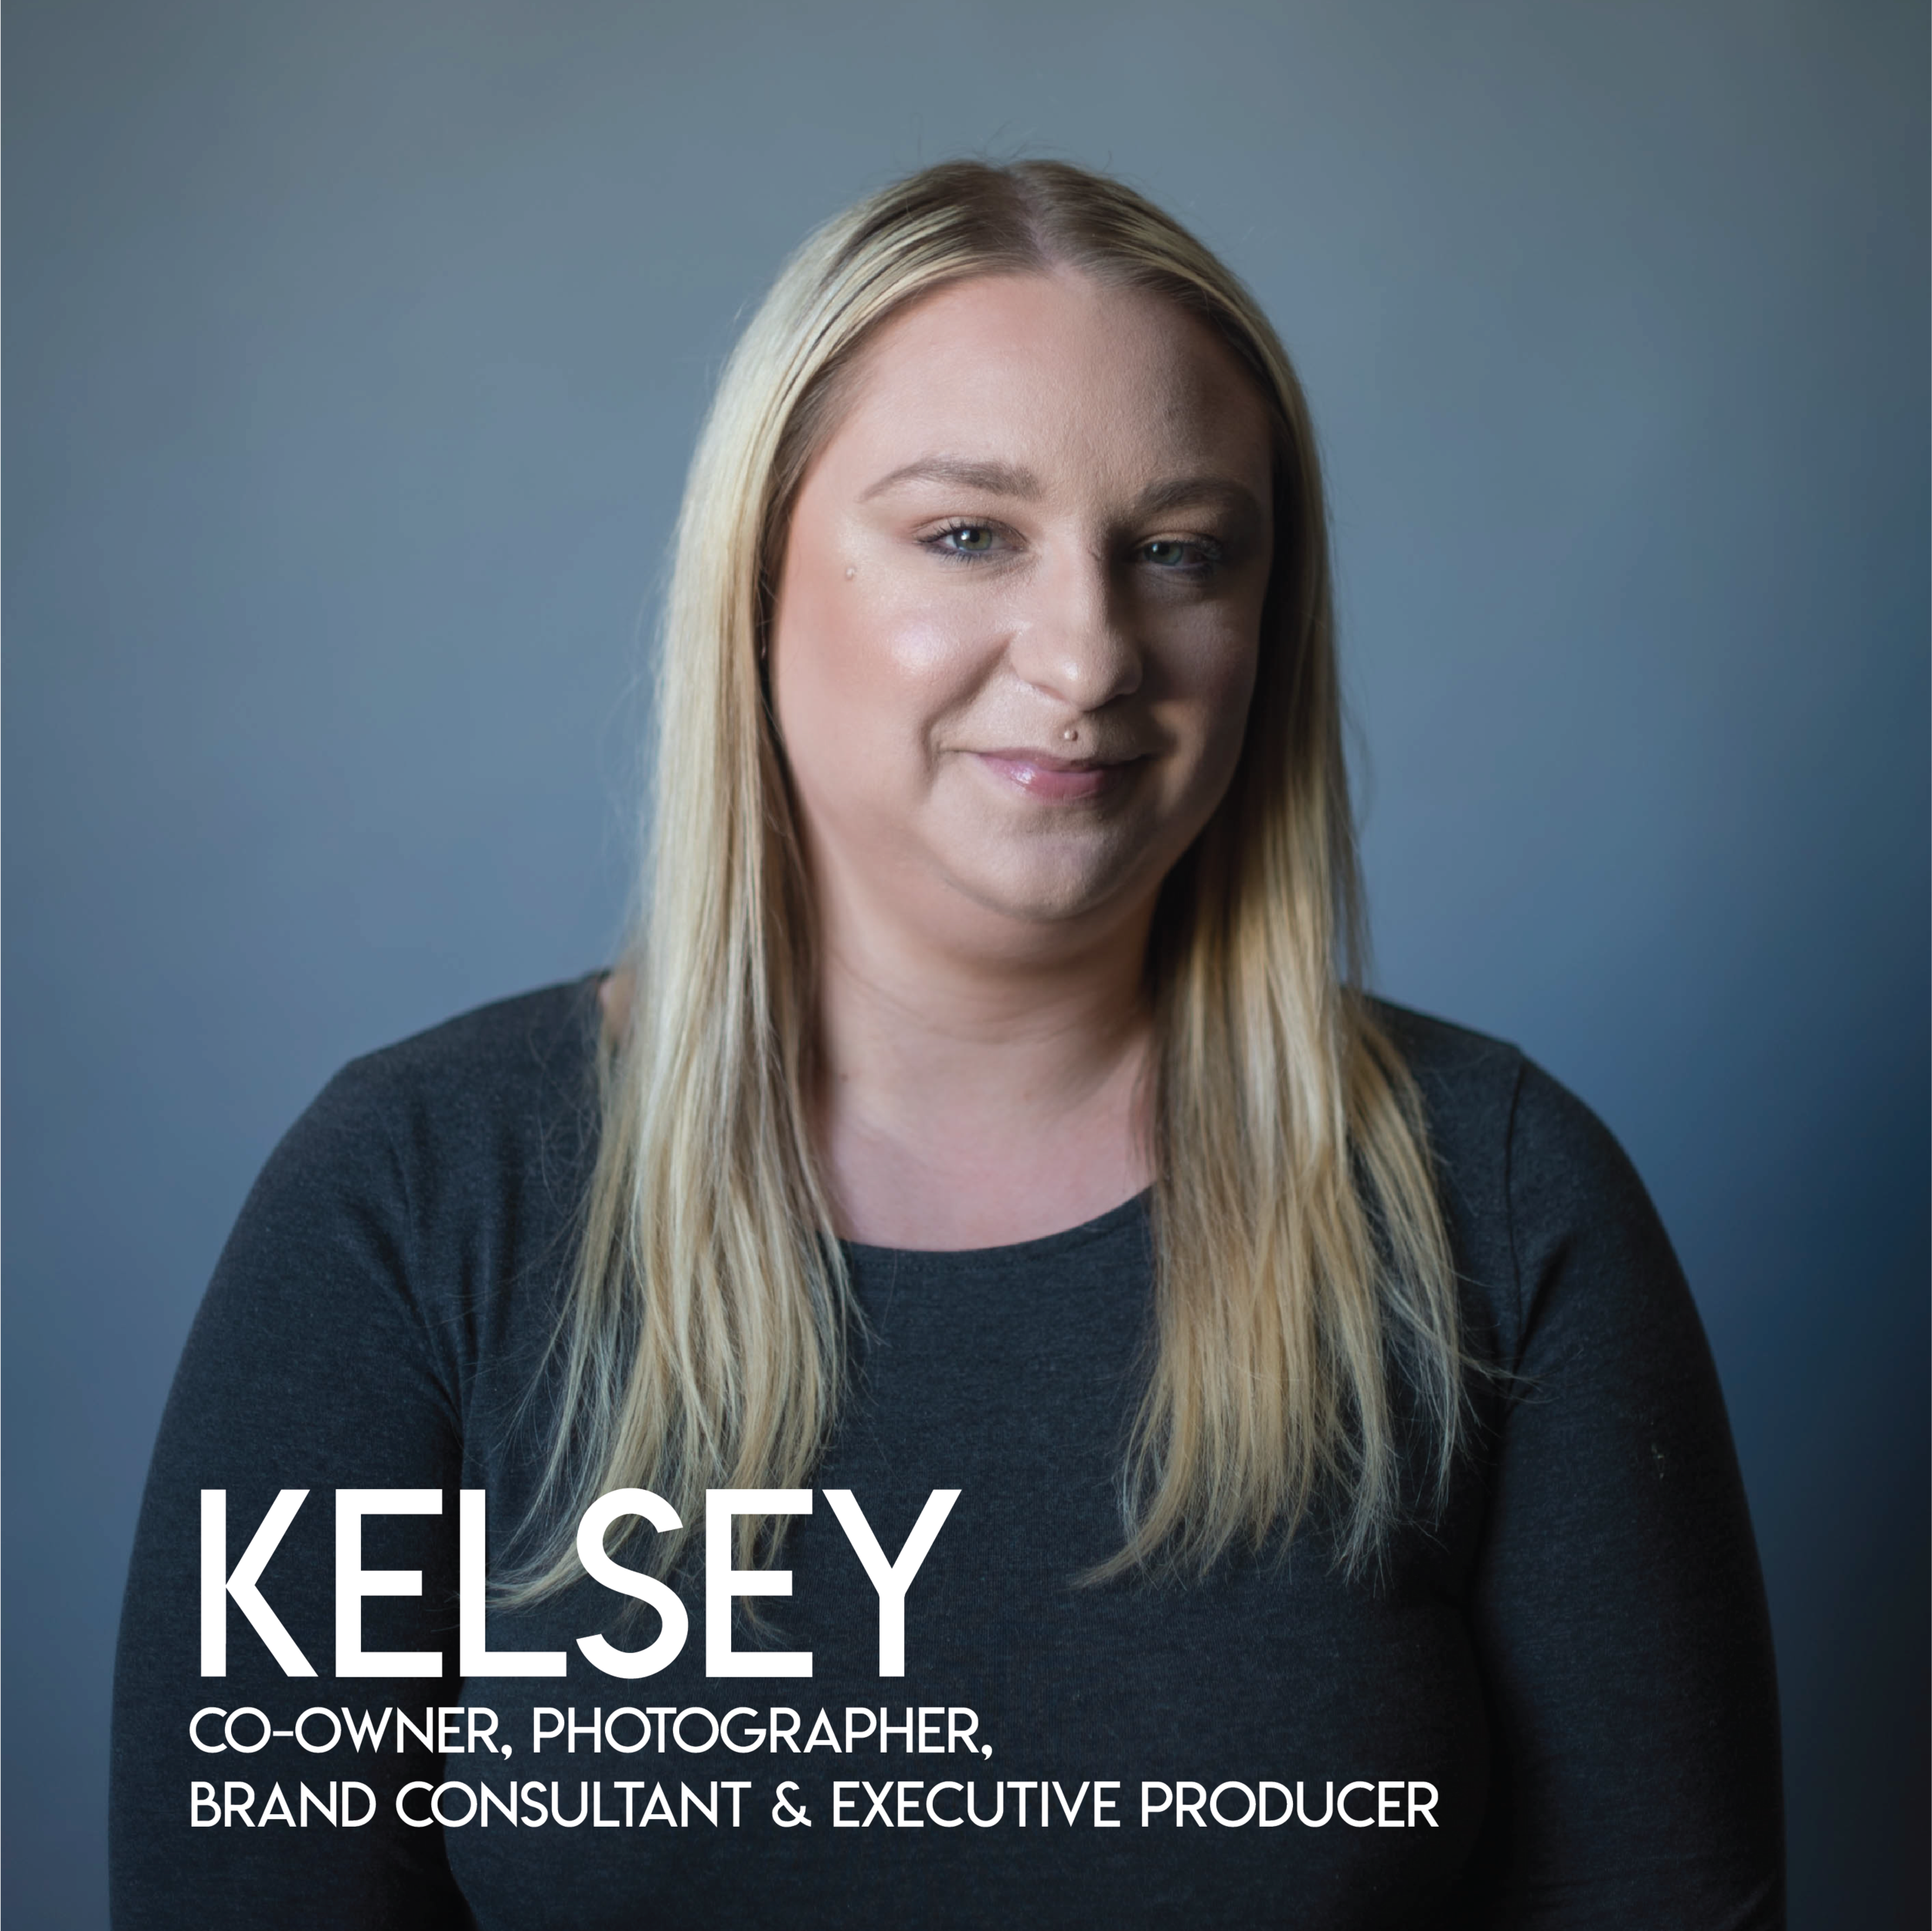 Kelsey-03.png